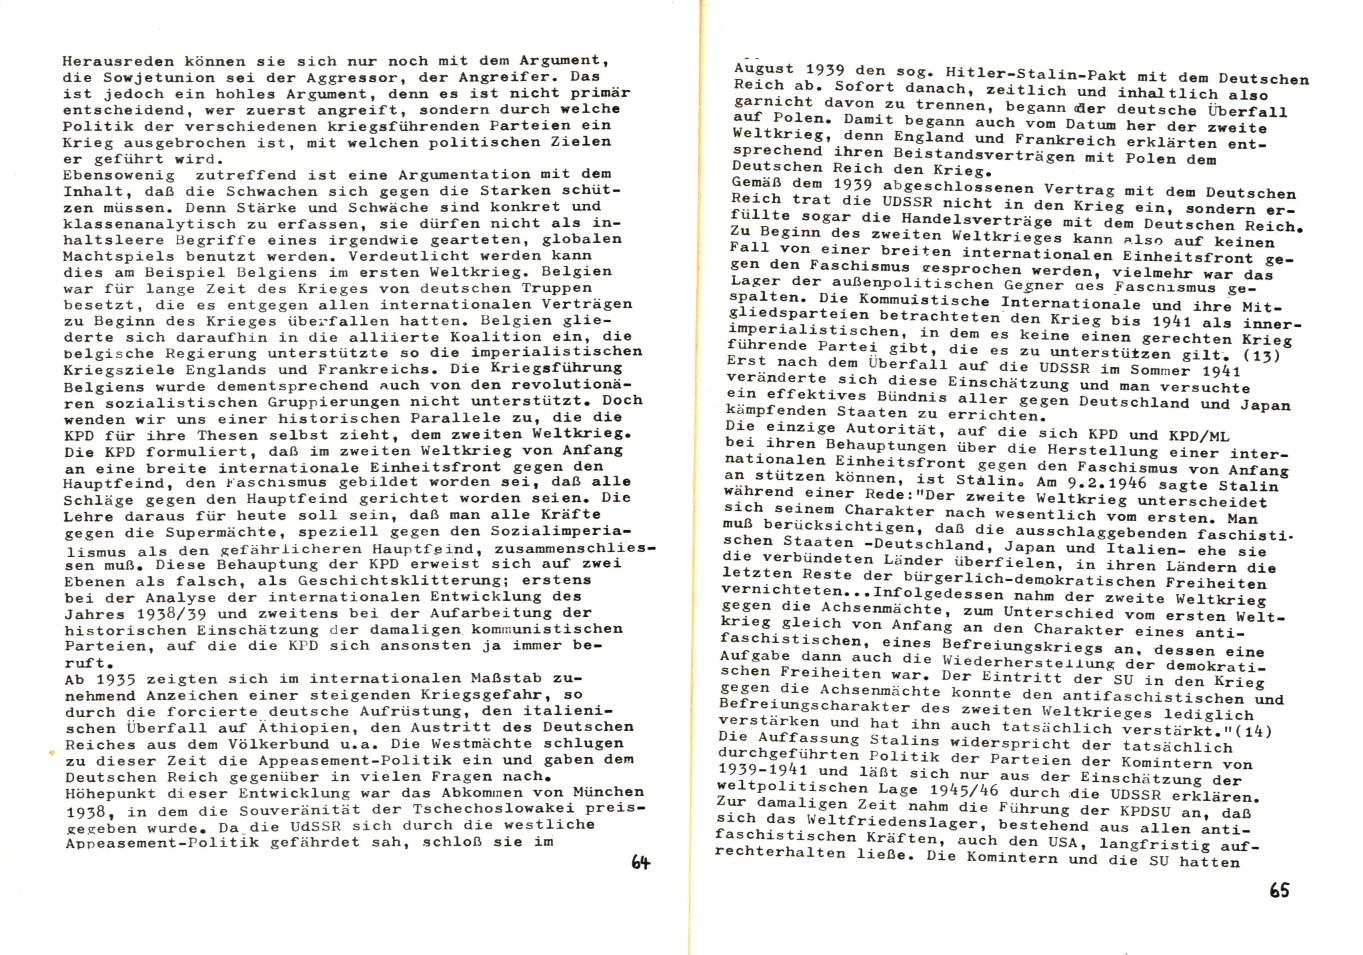 Berlin_KSV_1975_Dokumente_der_SAZ_34